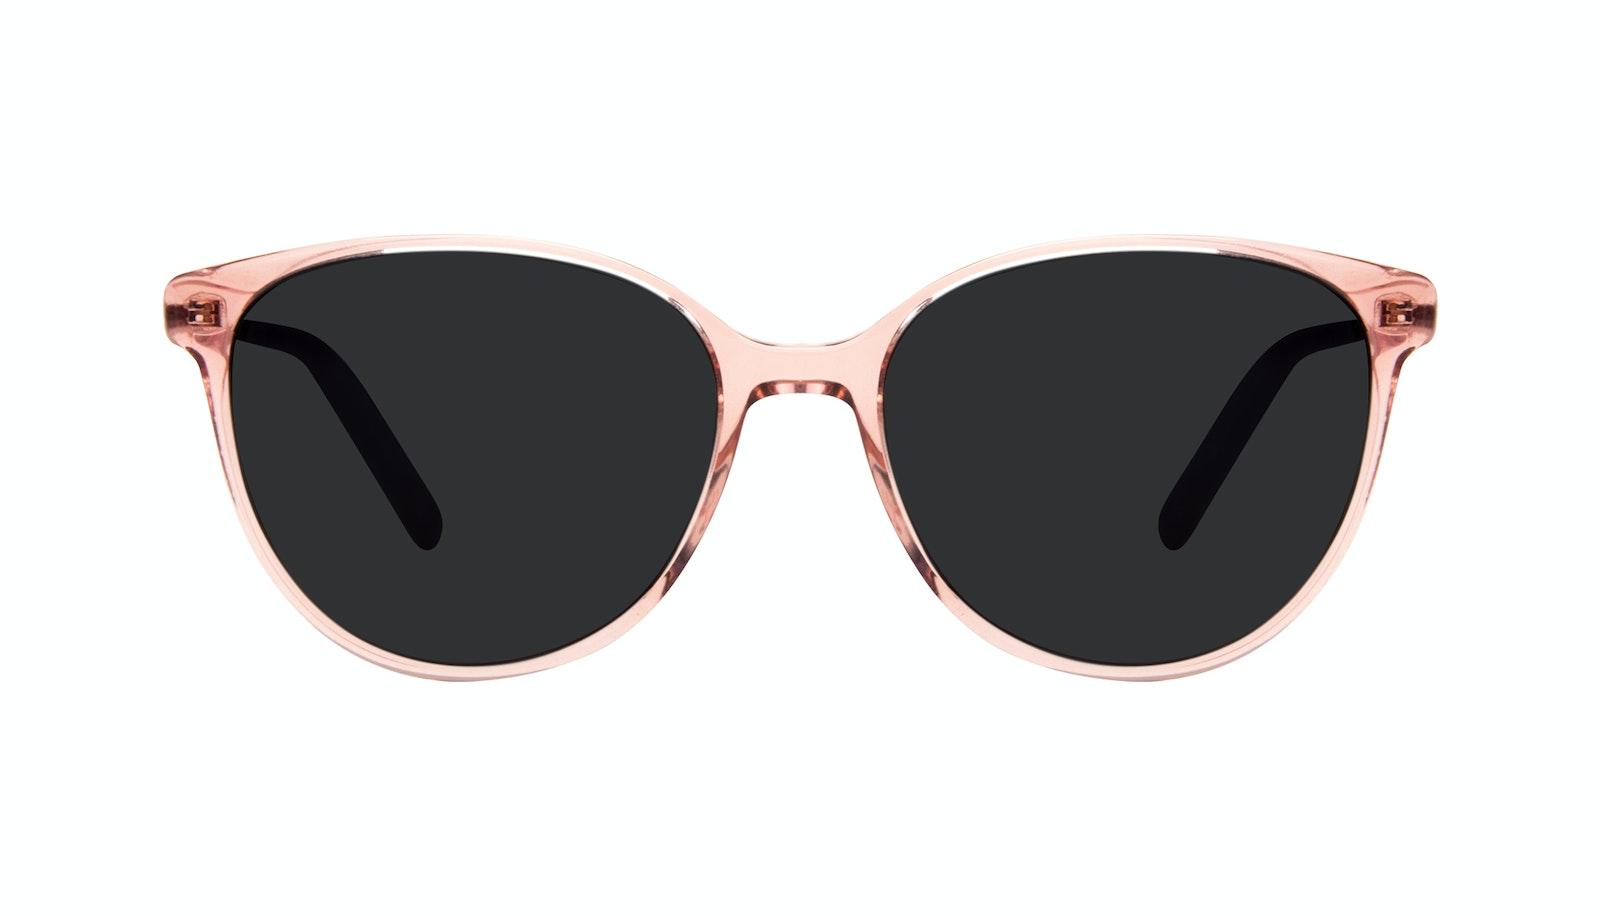 Affordable Fashion Glasses Round Sunglasses Women Imagine II Rose Marble